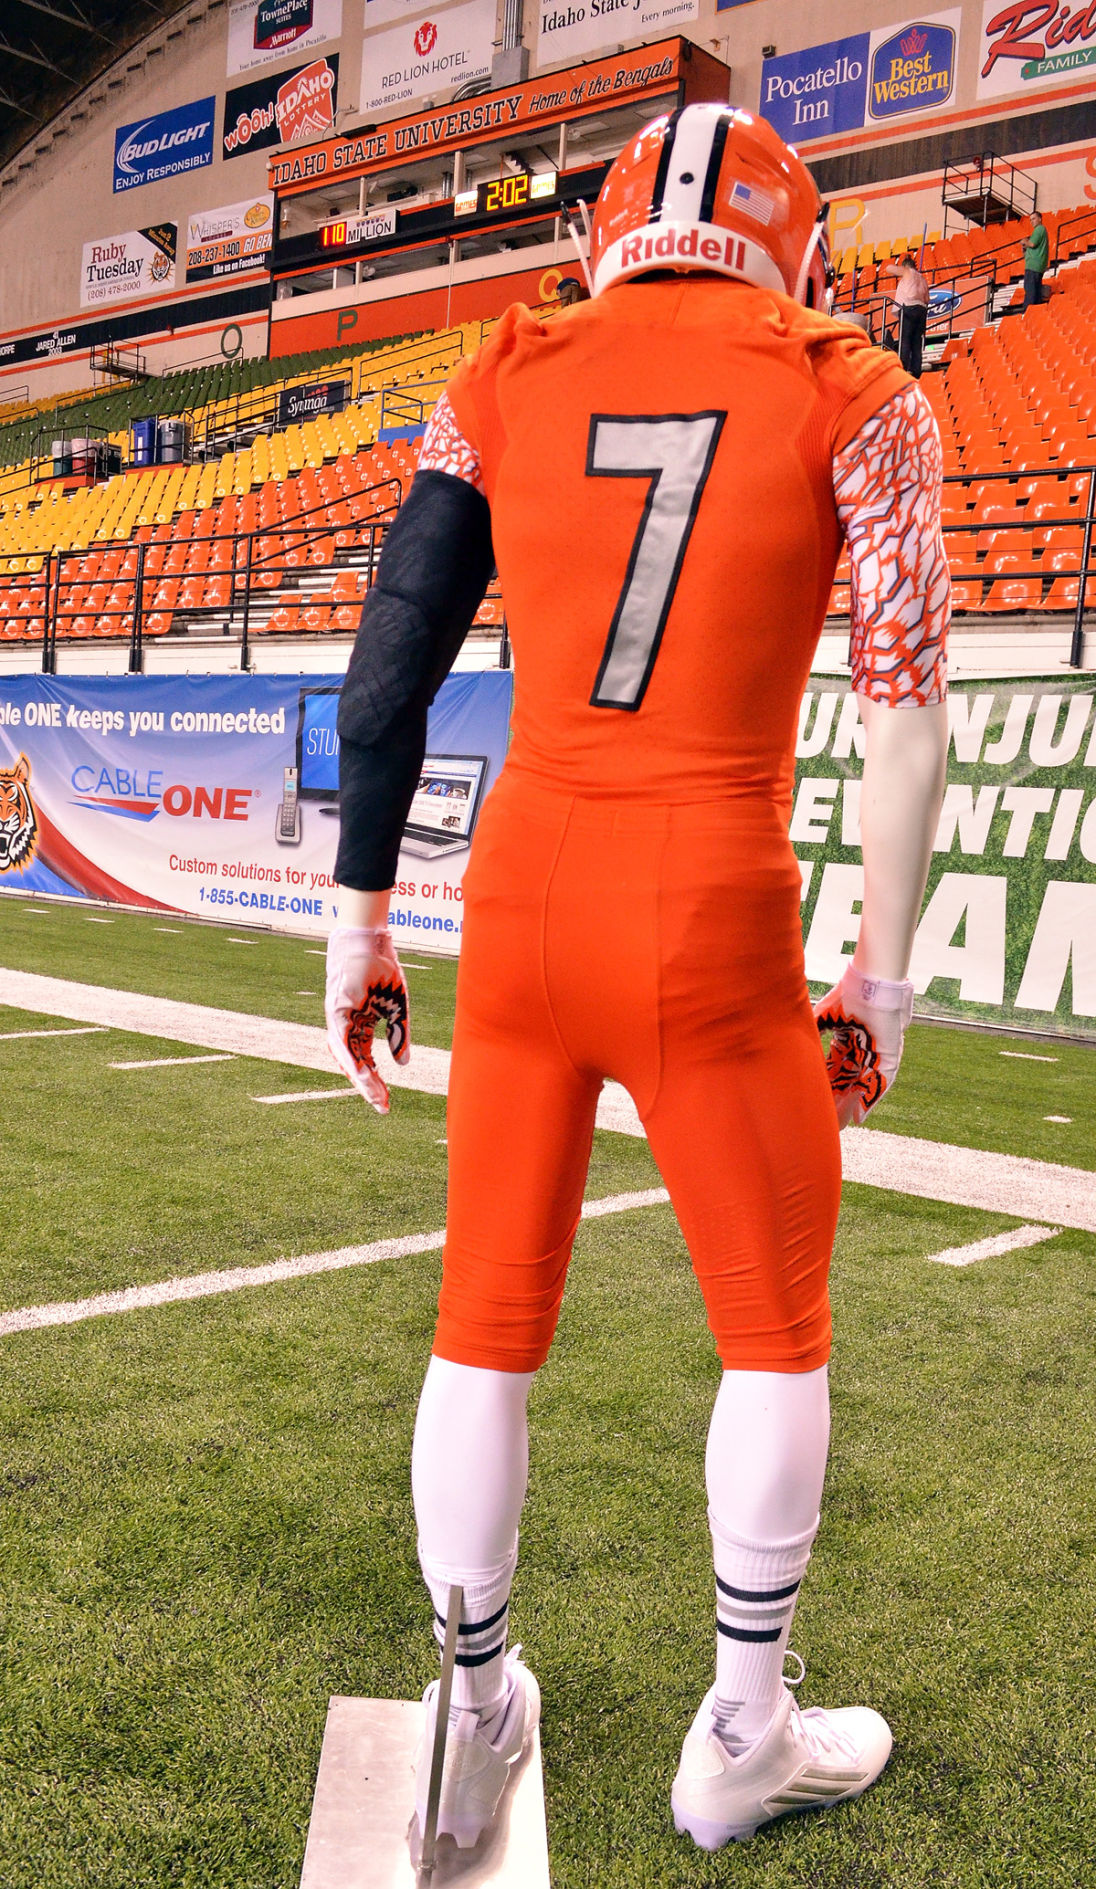 Isu Football A Fresh Look Idaho State Unveils New All Orange